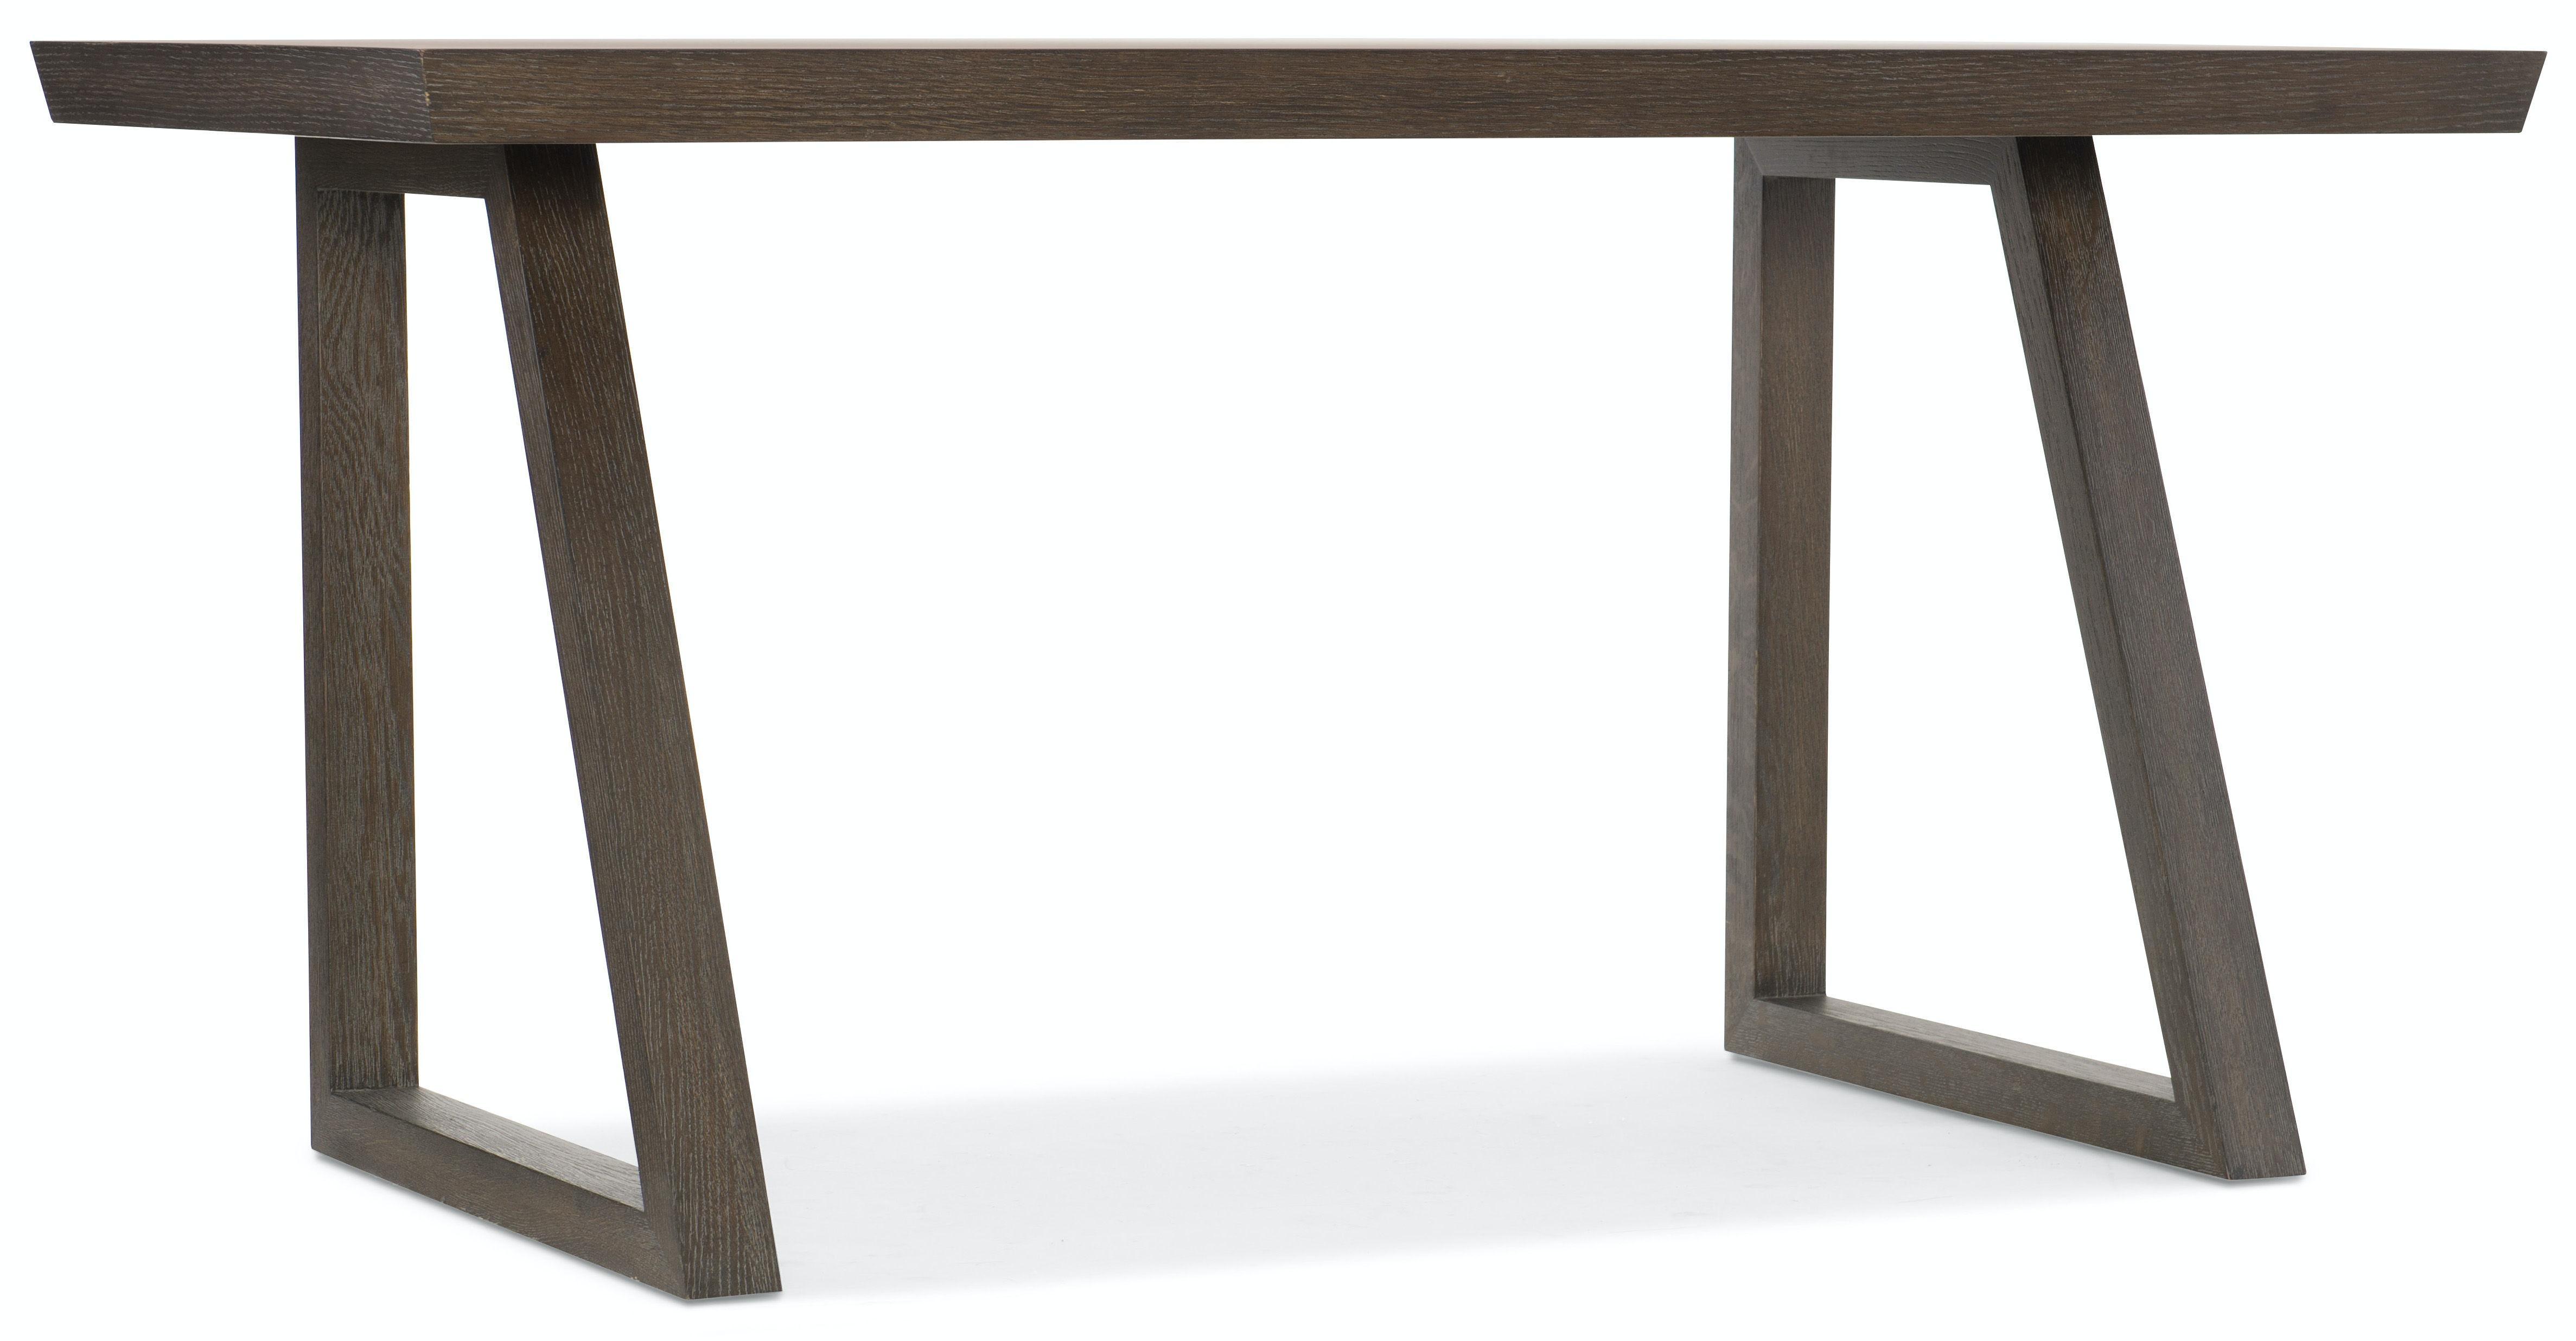 Hooker Furniture Miramar Aventura Andrea Writing Desk 6202 10458 DKW